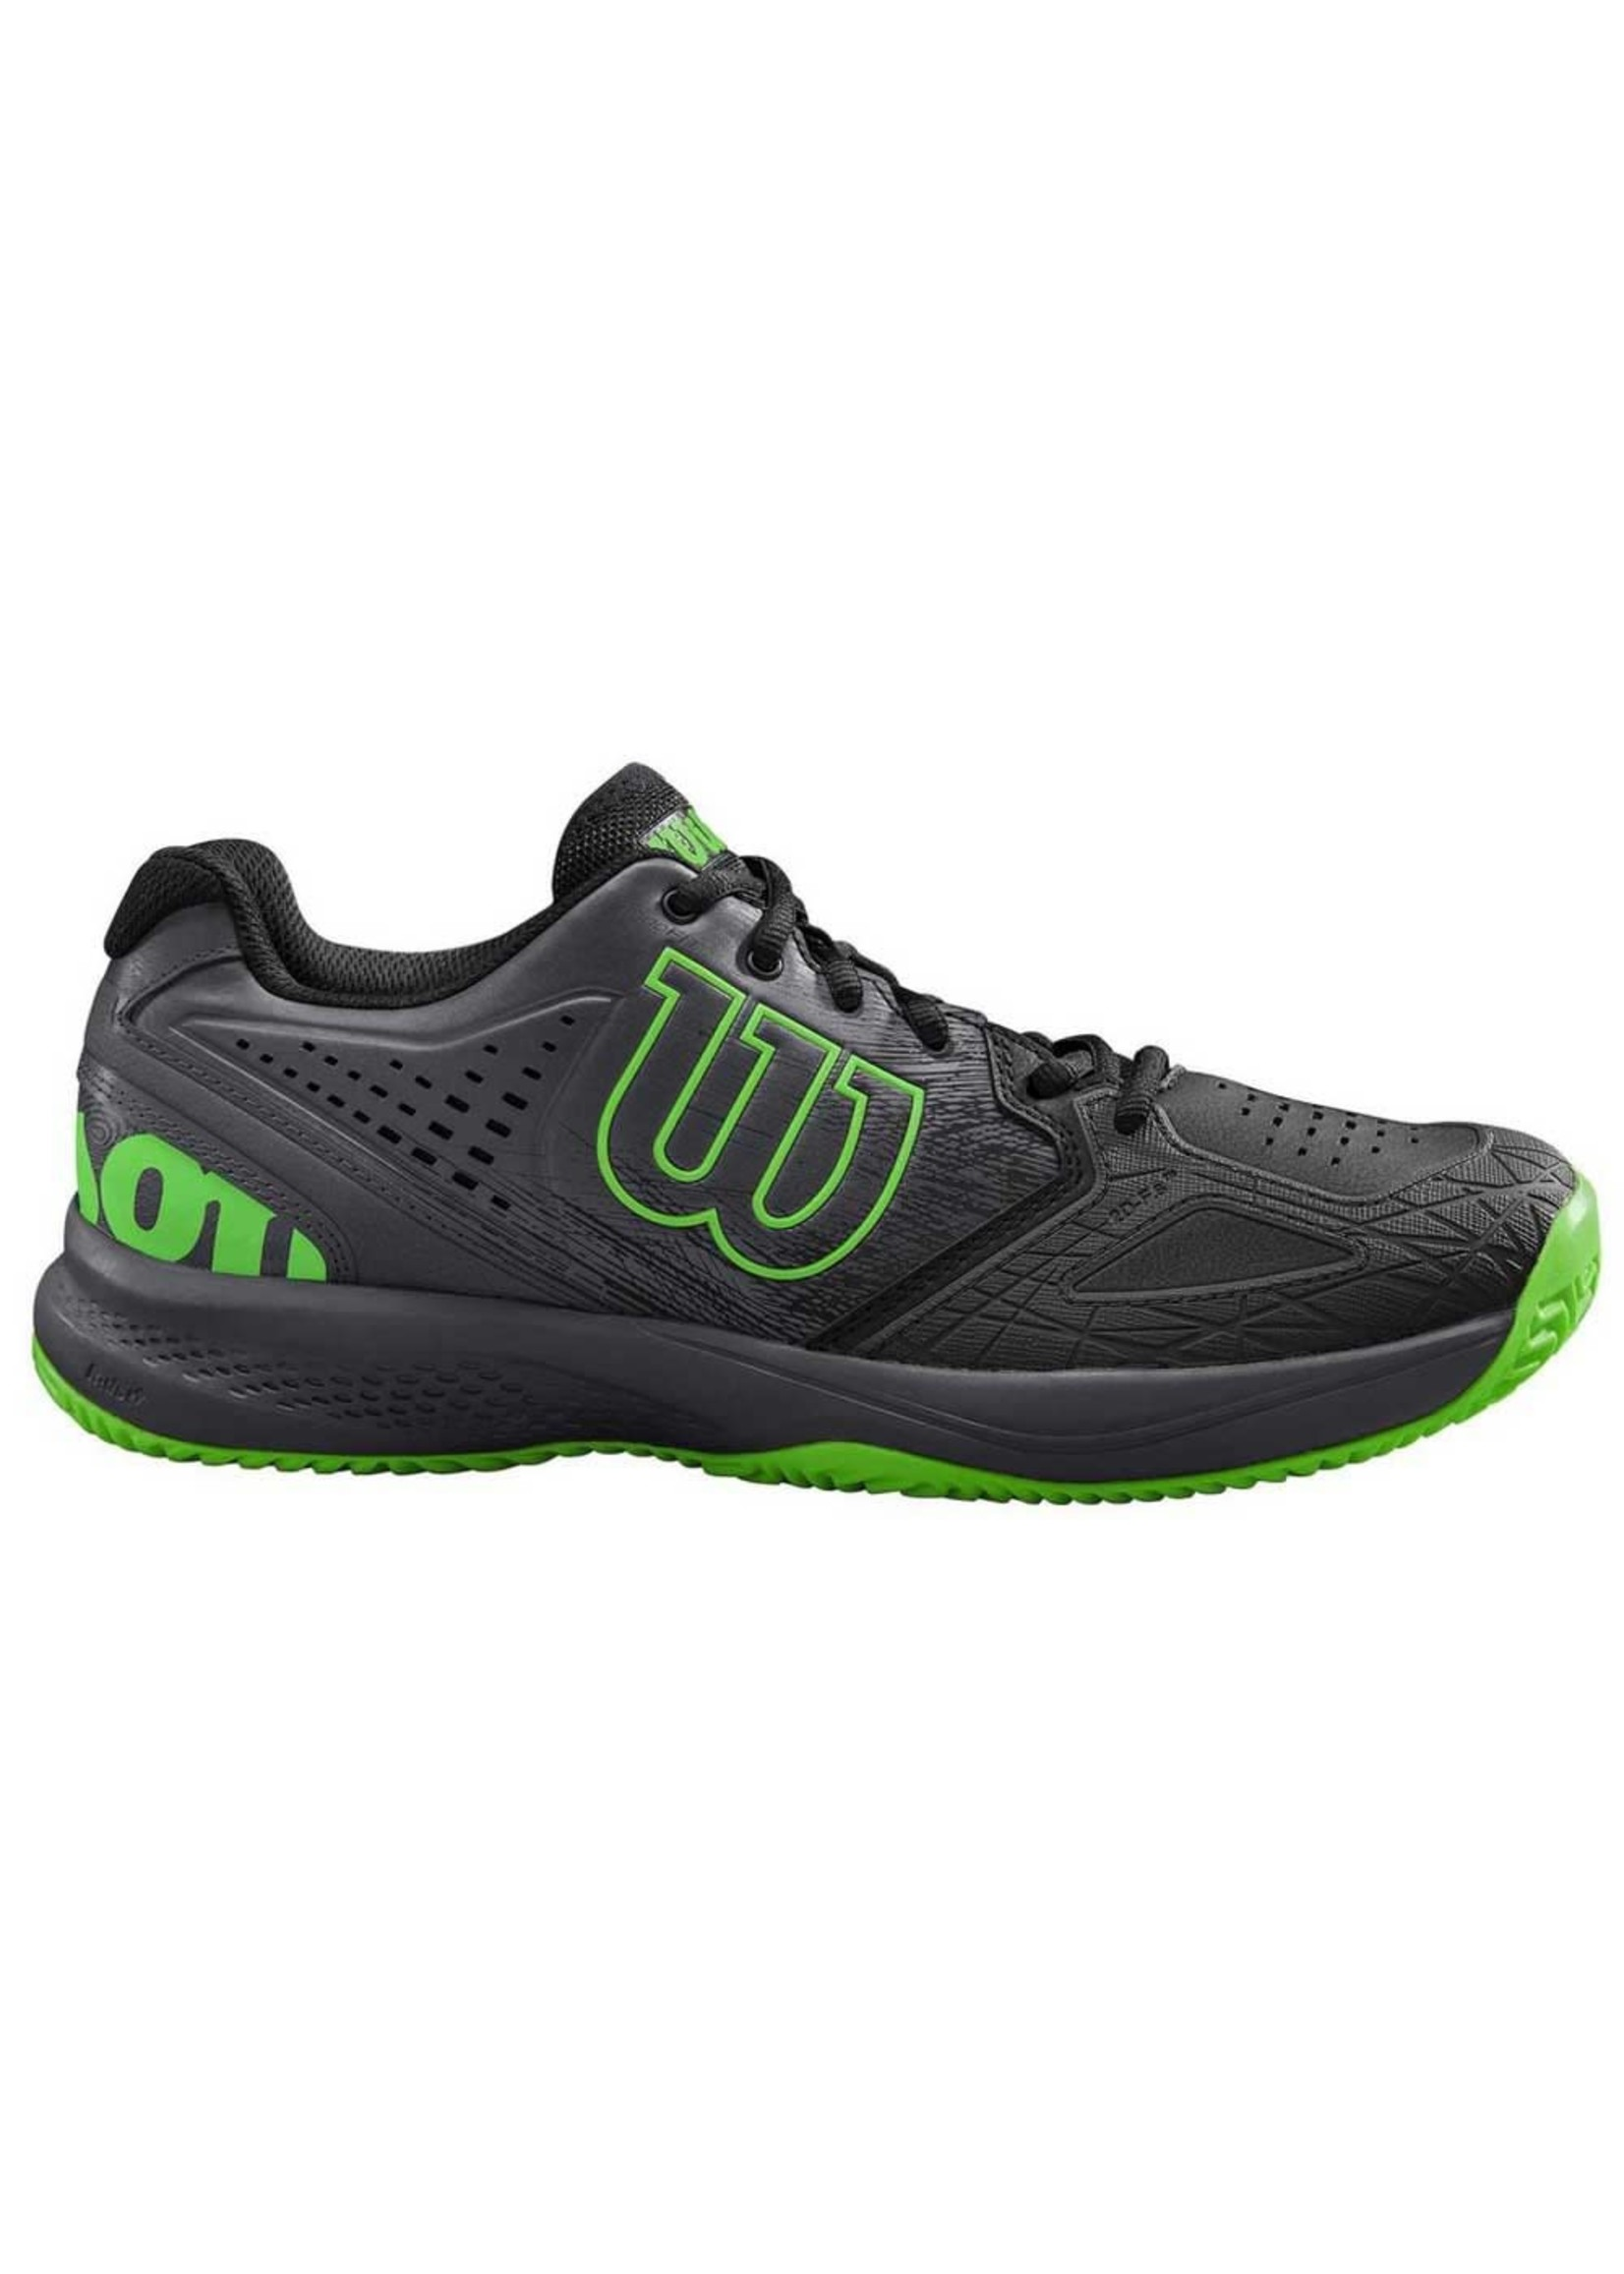 Wilson Wilson Kaos Comp 2.0 Mens Tennis Shoes (2019)